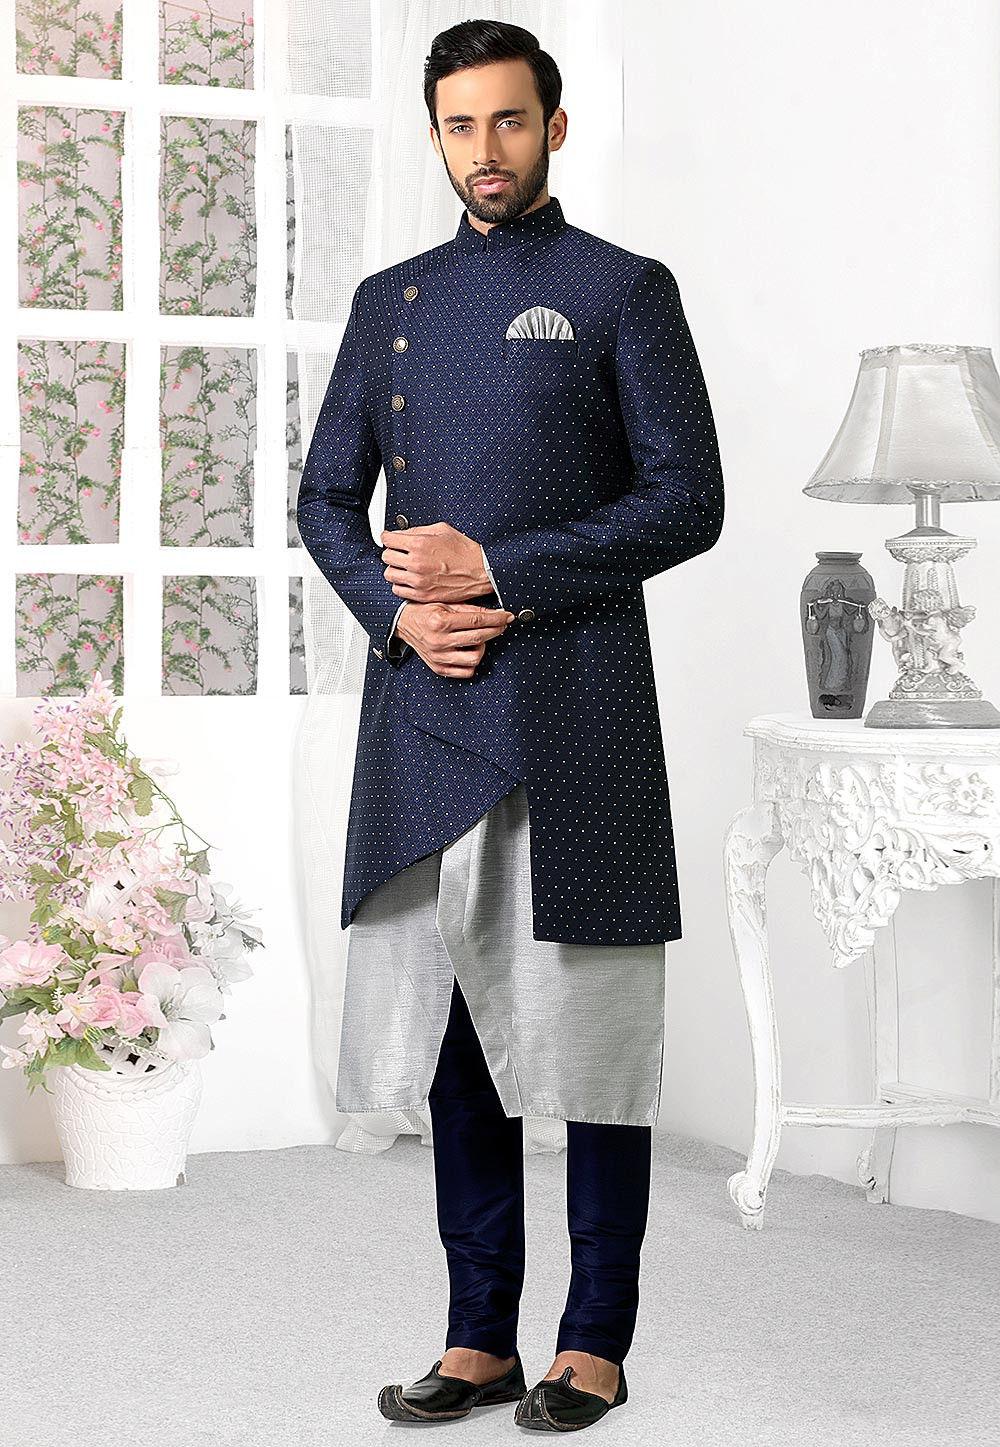 Slikovnica - Page 15 Woven-art-silk-jacket-style-sherwani-in-blue-and-grey-v1-mhg1352